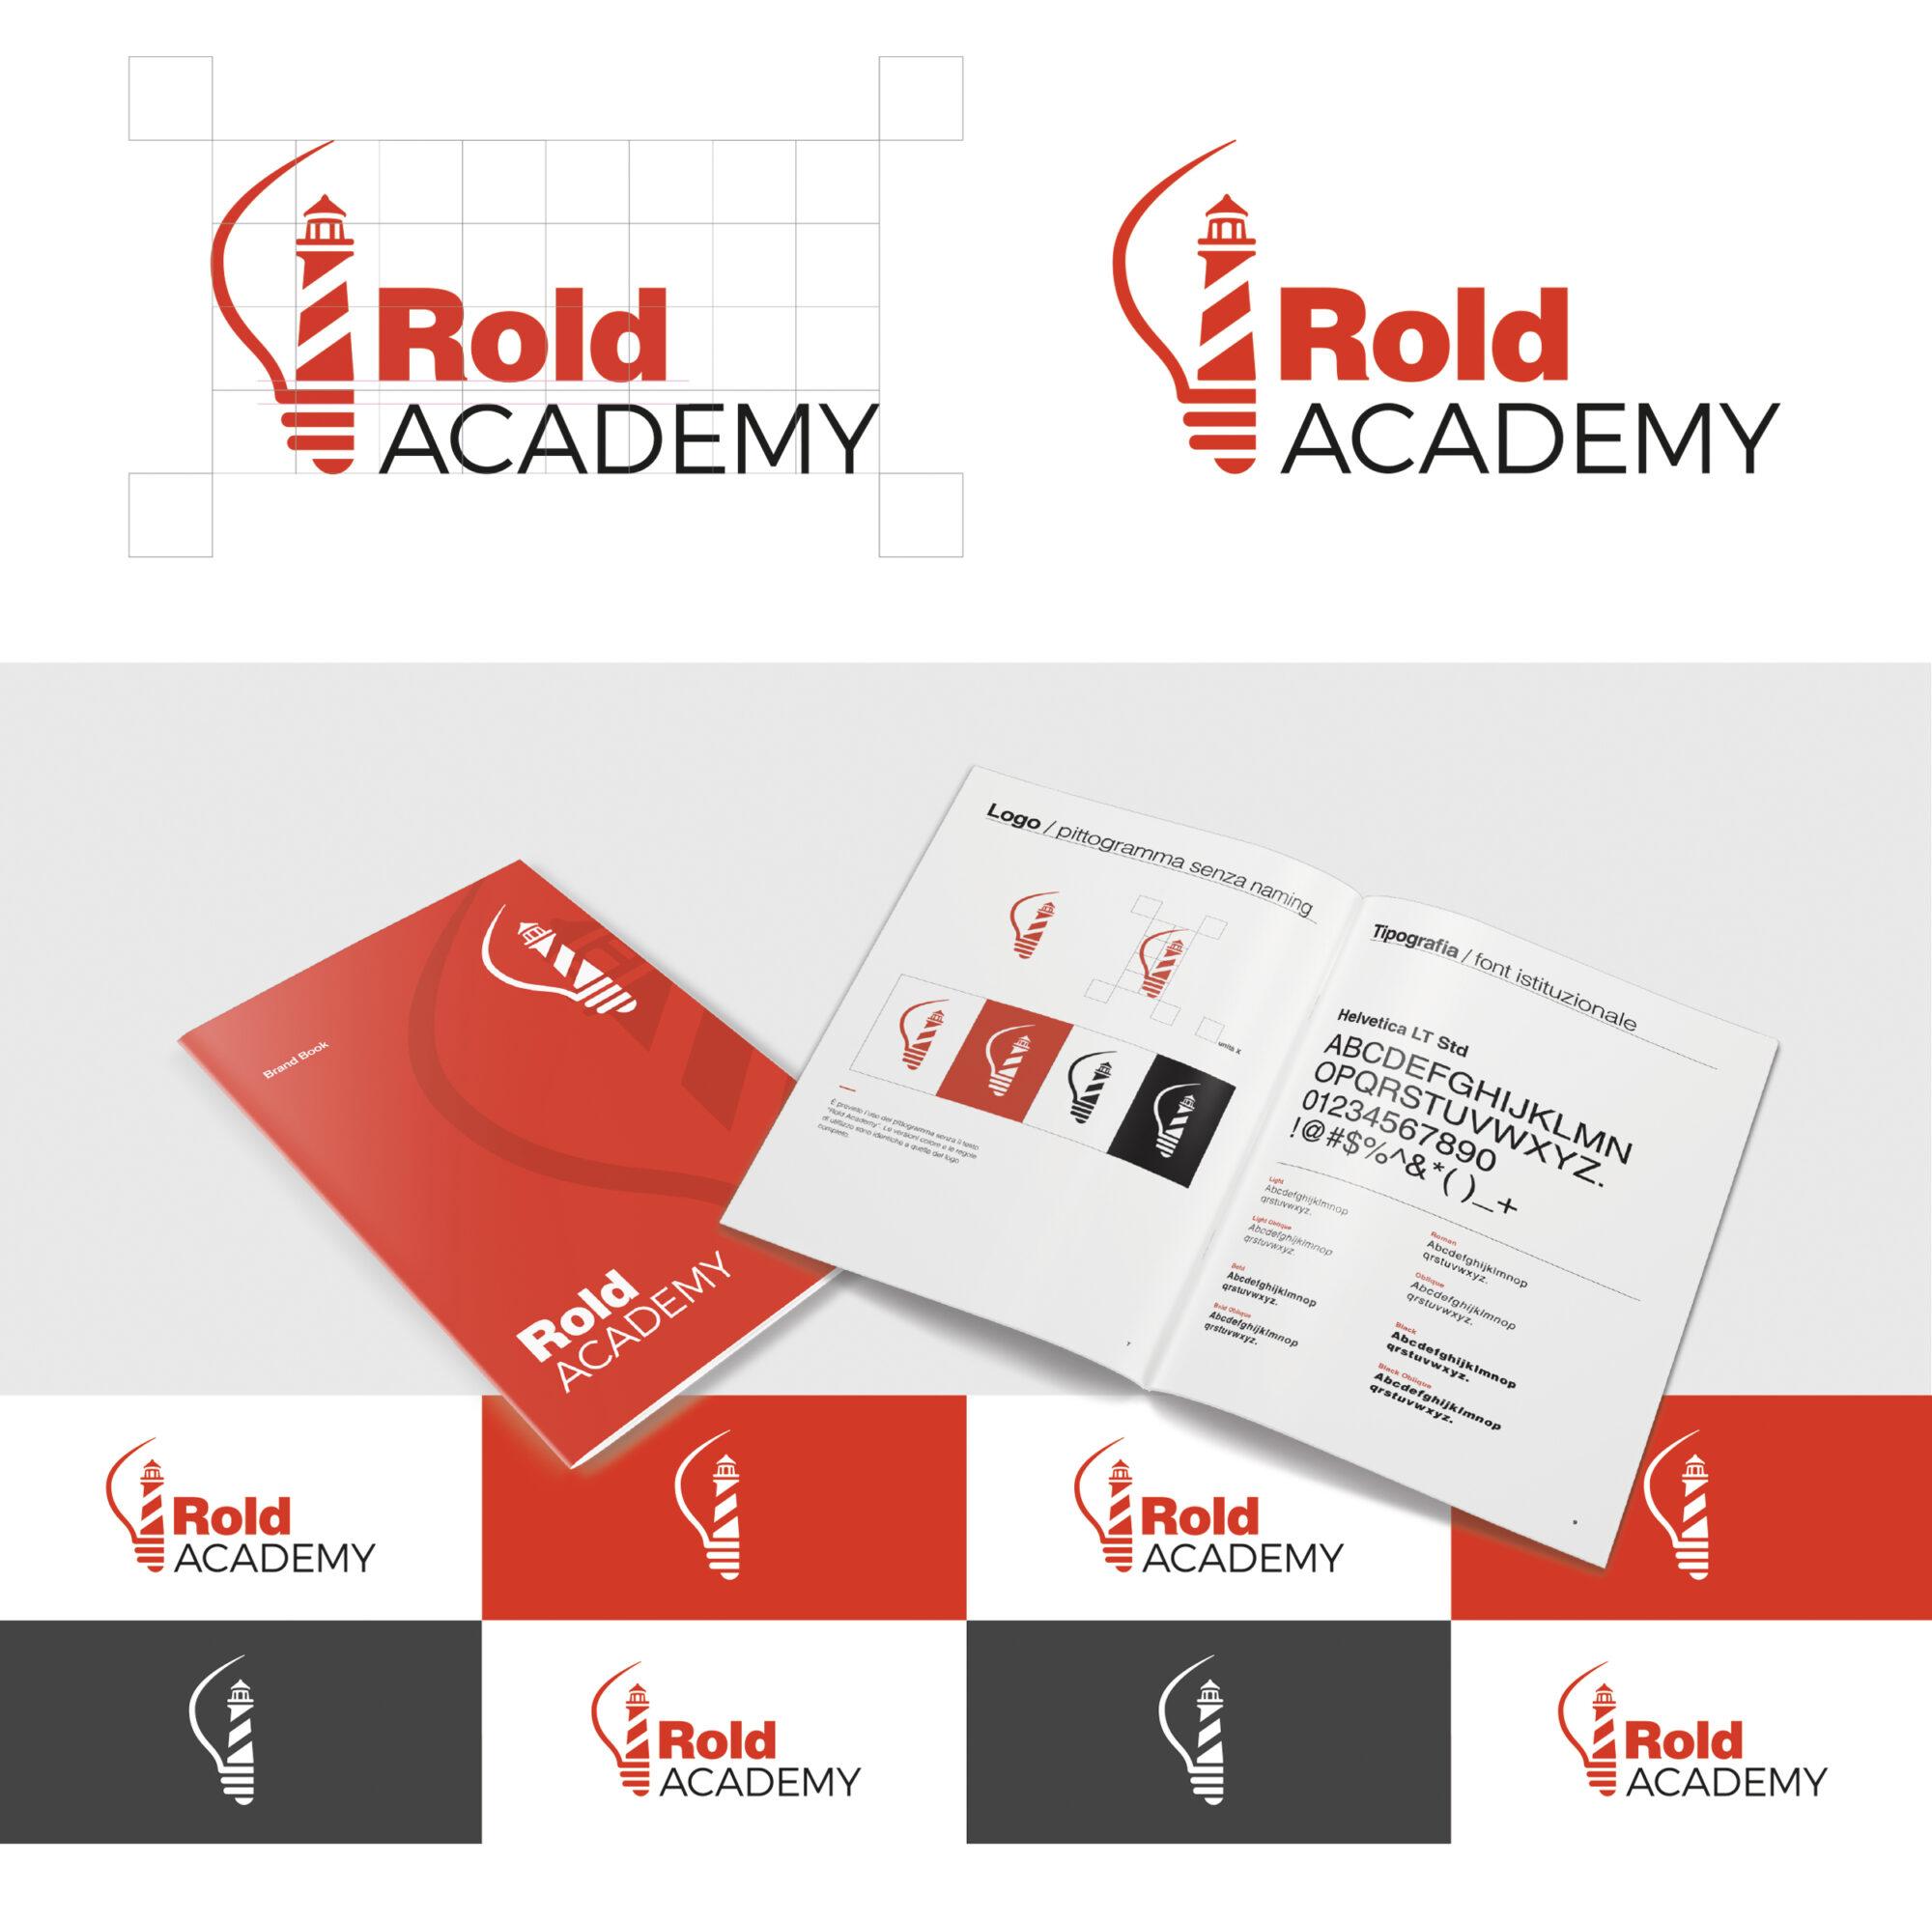 rold academy branding